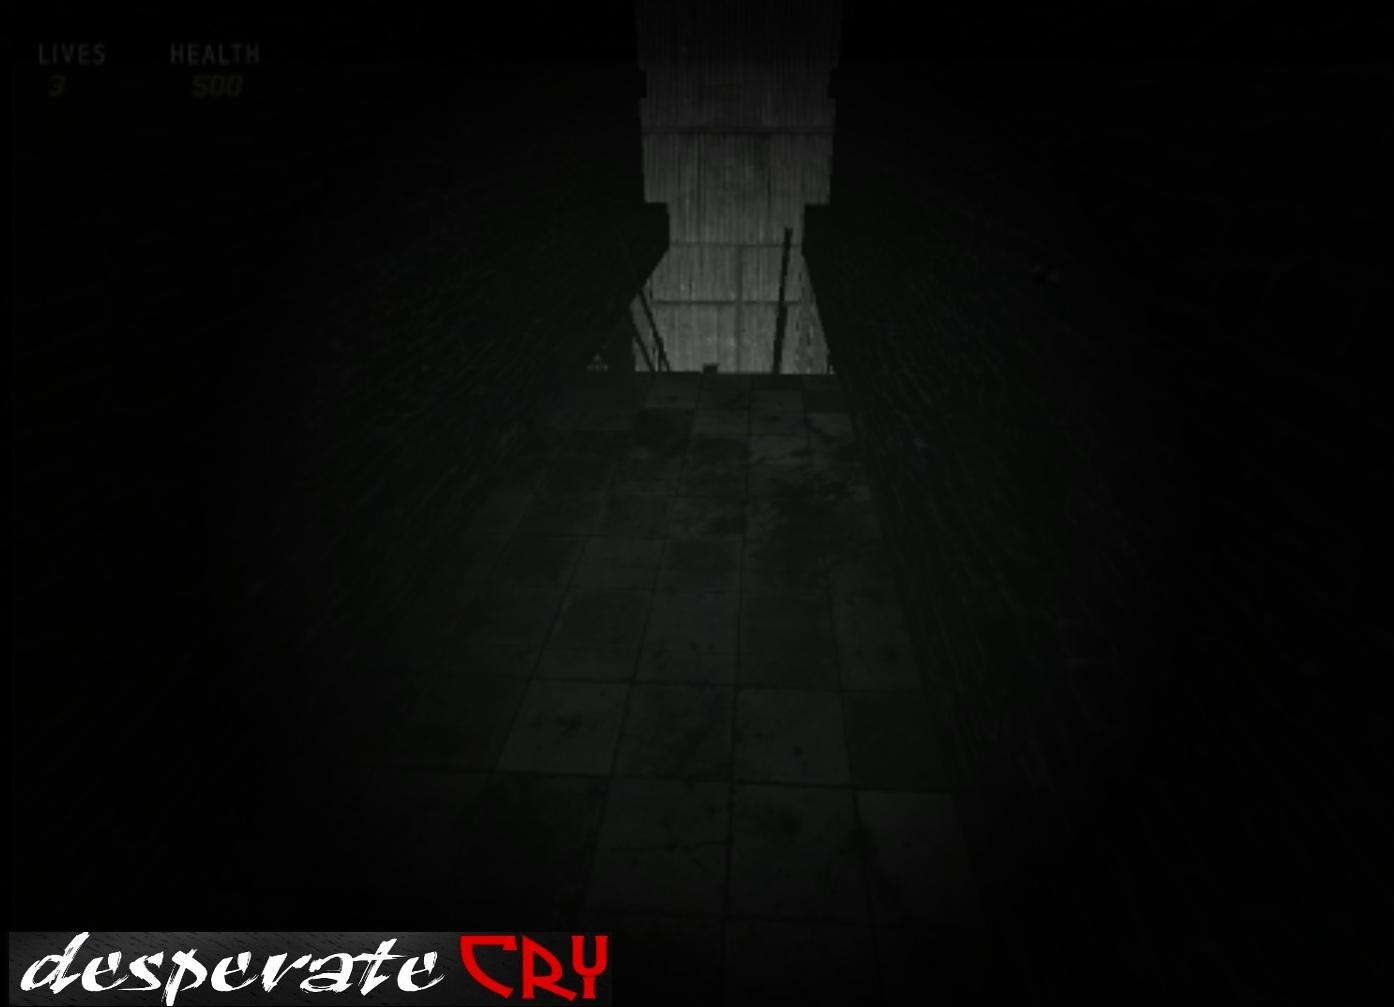 342 image - Desperate Cry